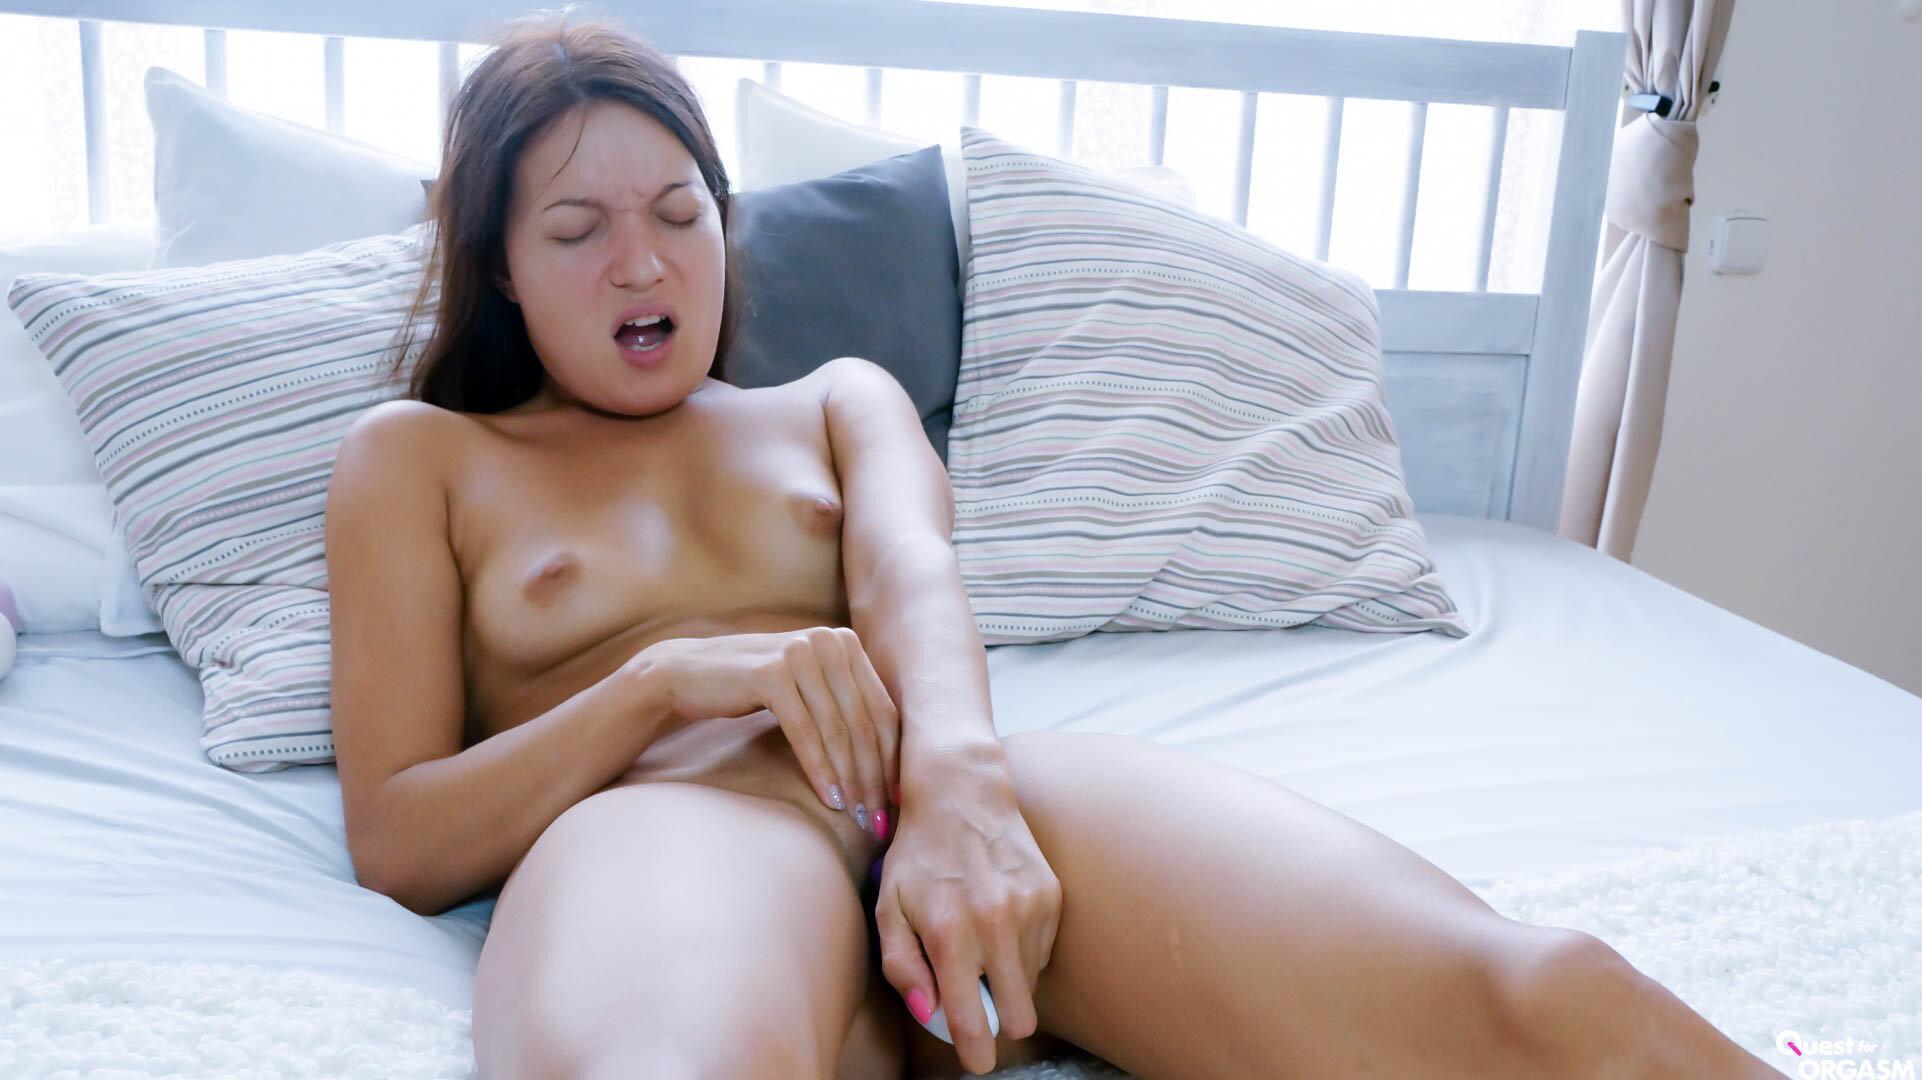 Atemberaubende Brünette Masturbiert Mit Ihrem Dildo